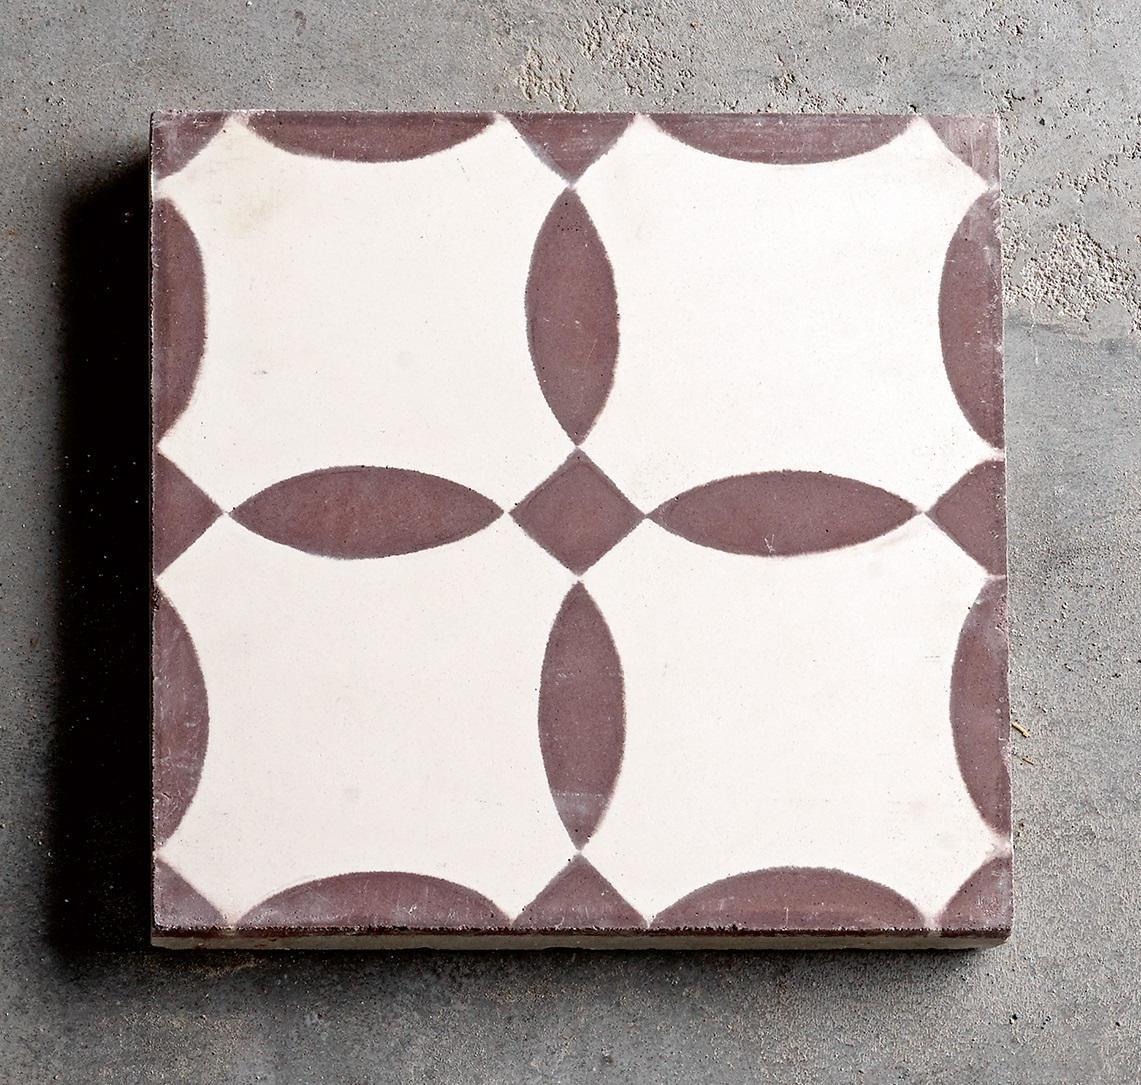 Tine K Home Cementová kachle Flower Brown, hnědá barva, beton